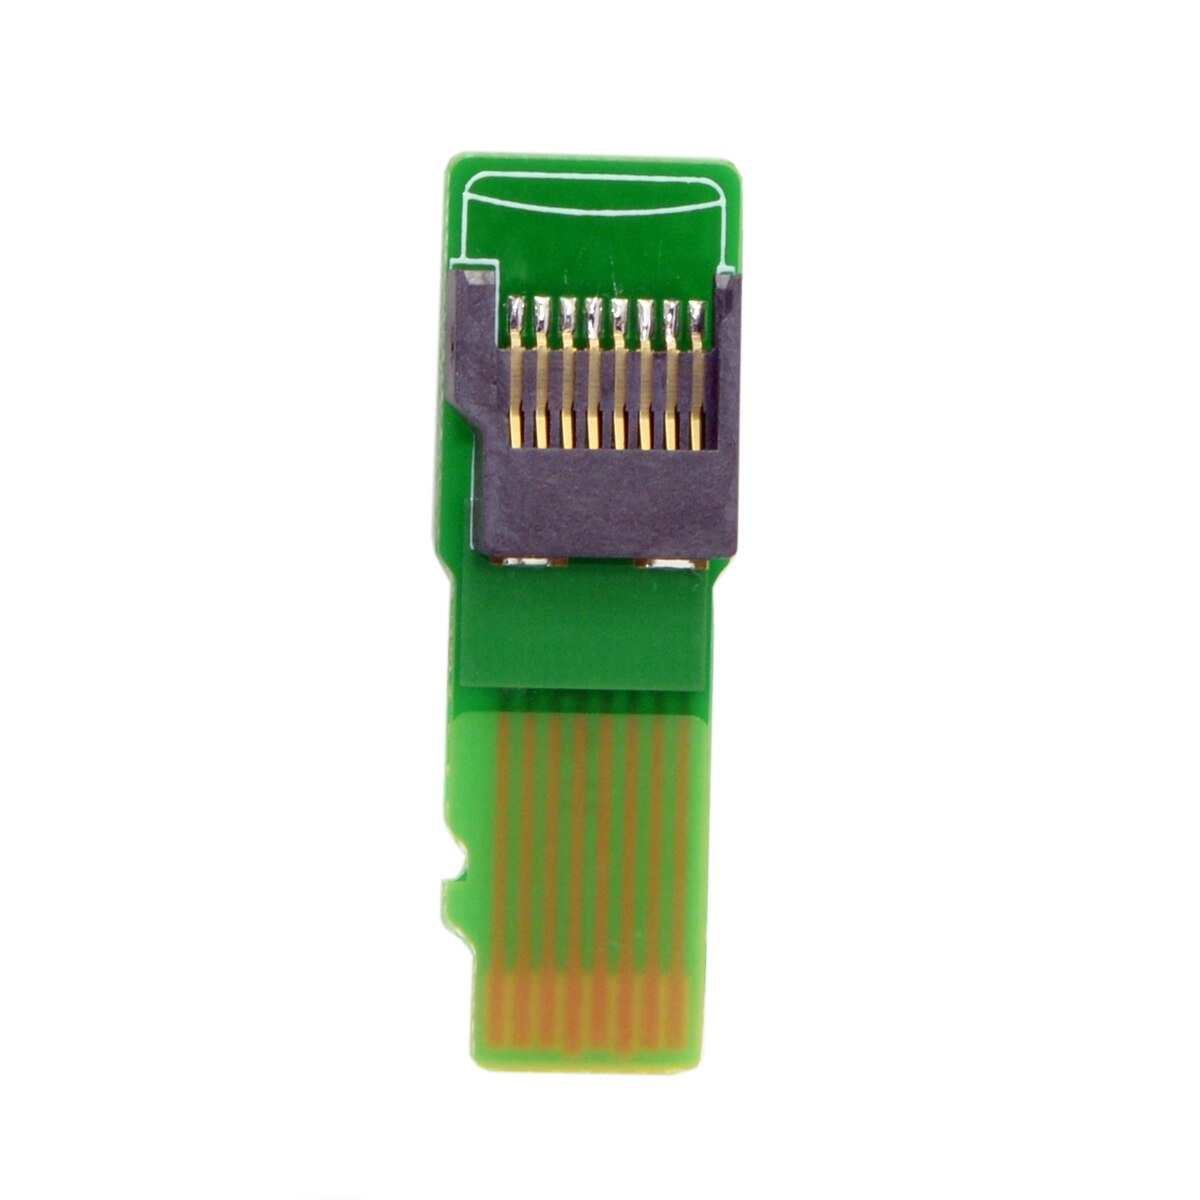 CY Micro SD tarjeta de memoria TF Kit extensión de macho a hembra adaptador extensor herramientas de prueba PCBA